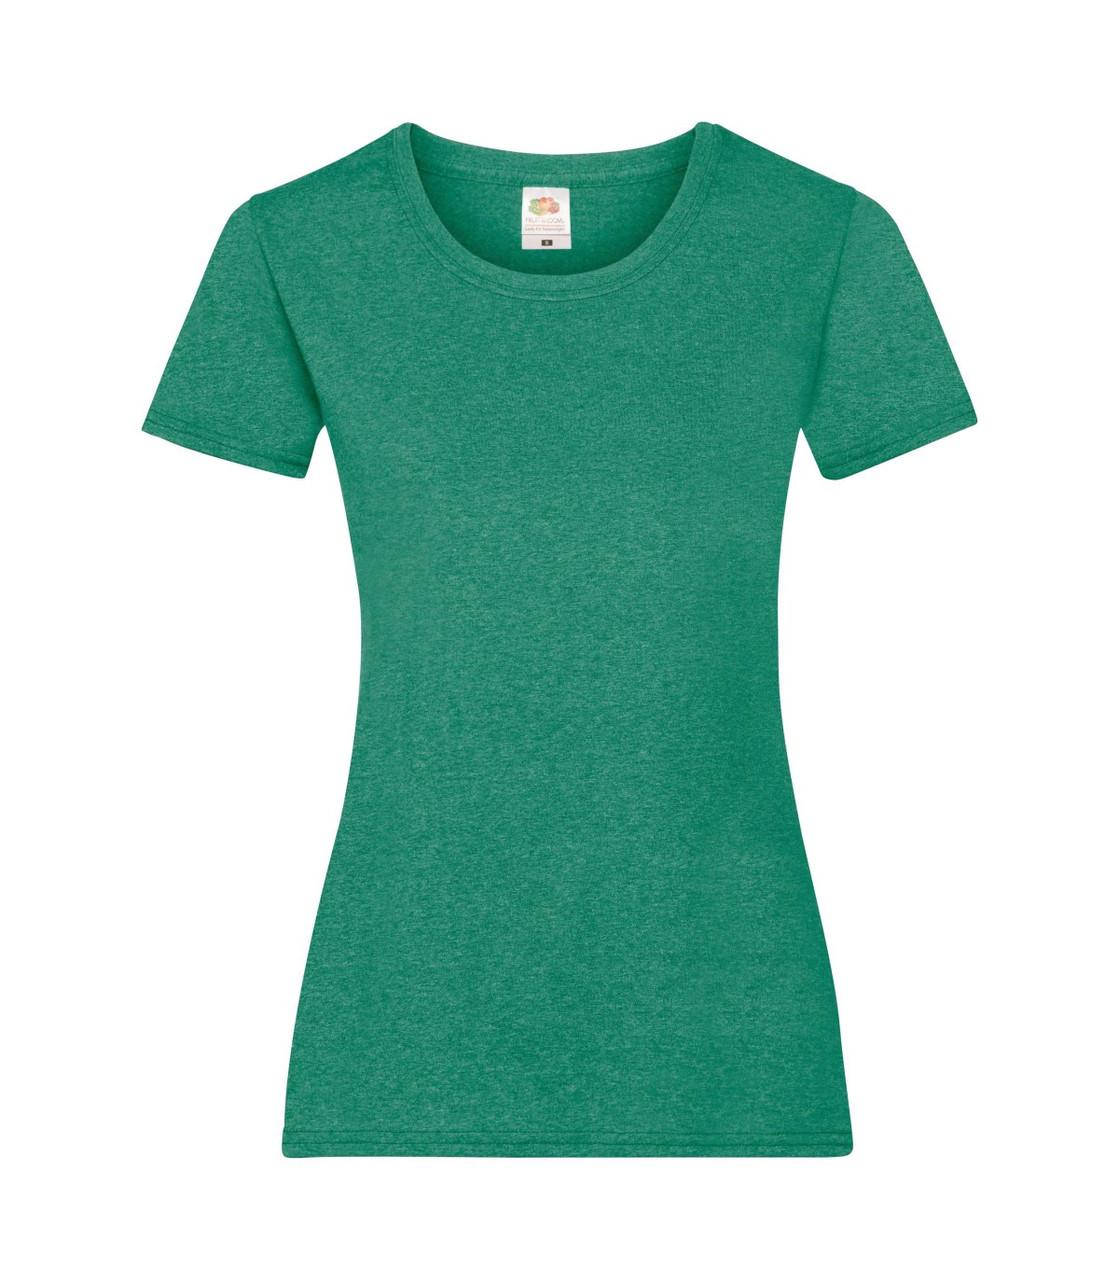 Женская футболка зеленая меланж 372-RX